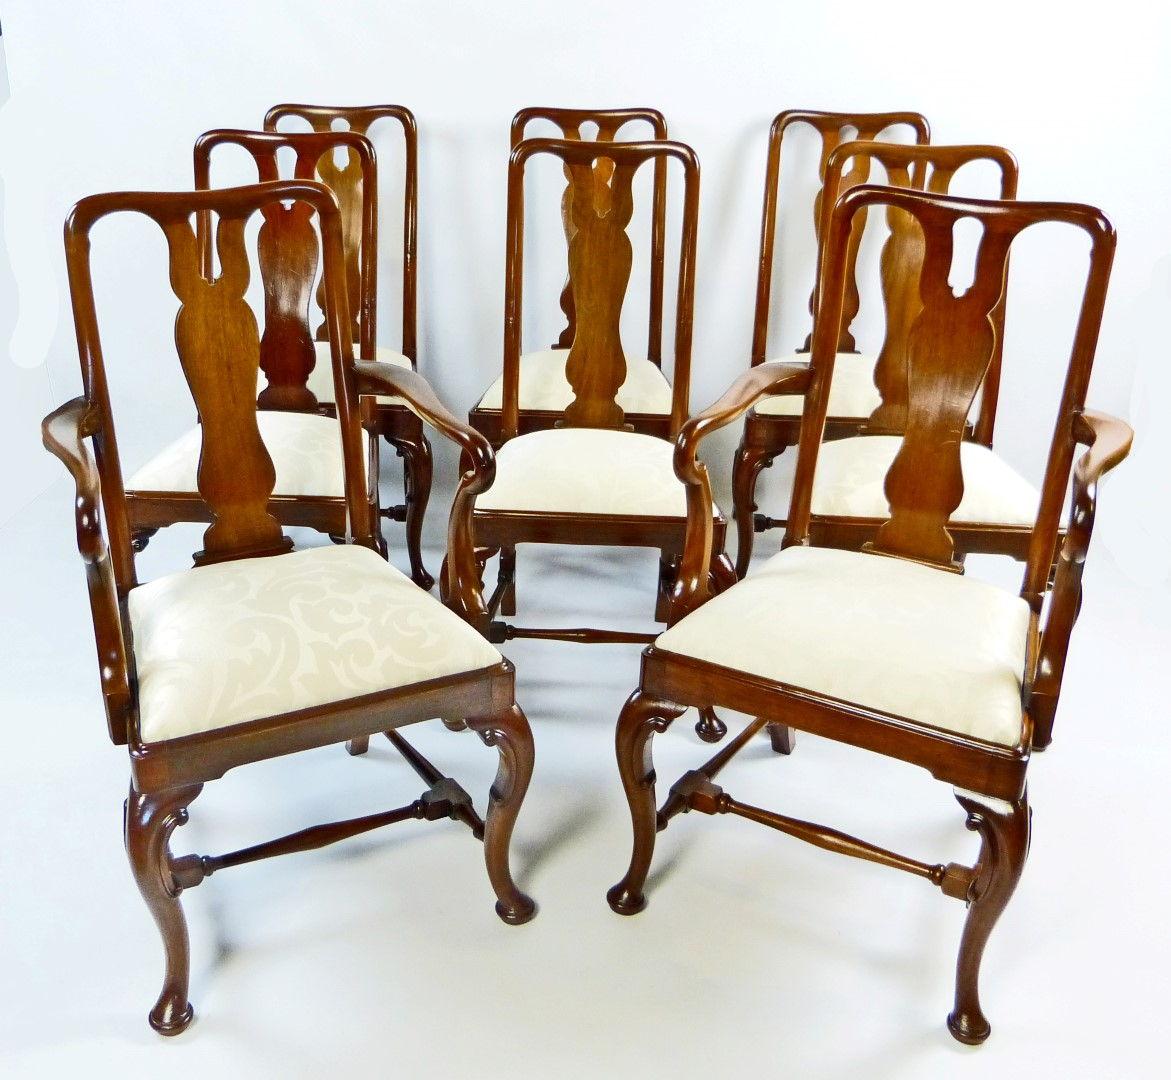 sillas de comedor sillas de comedor sillas de comedor ...